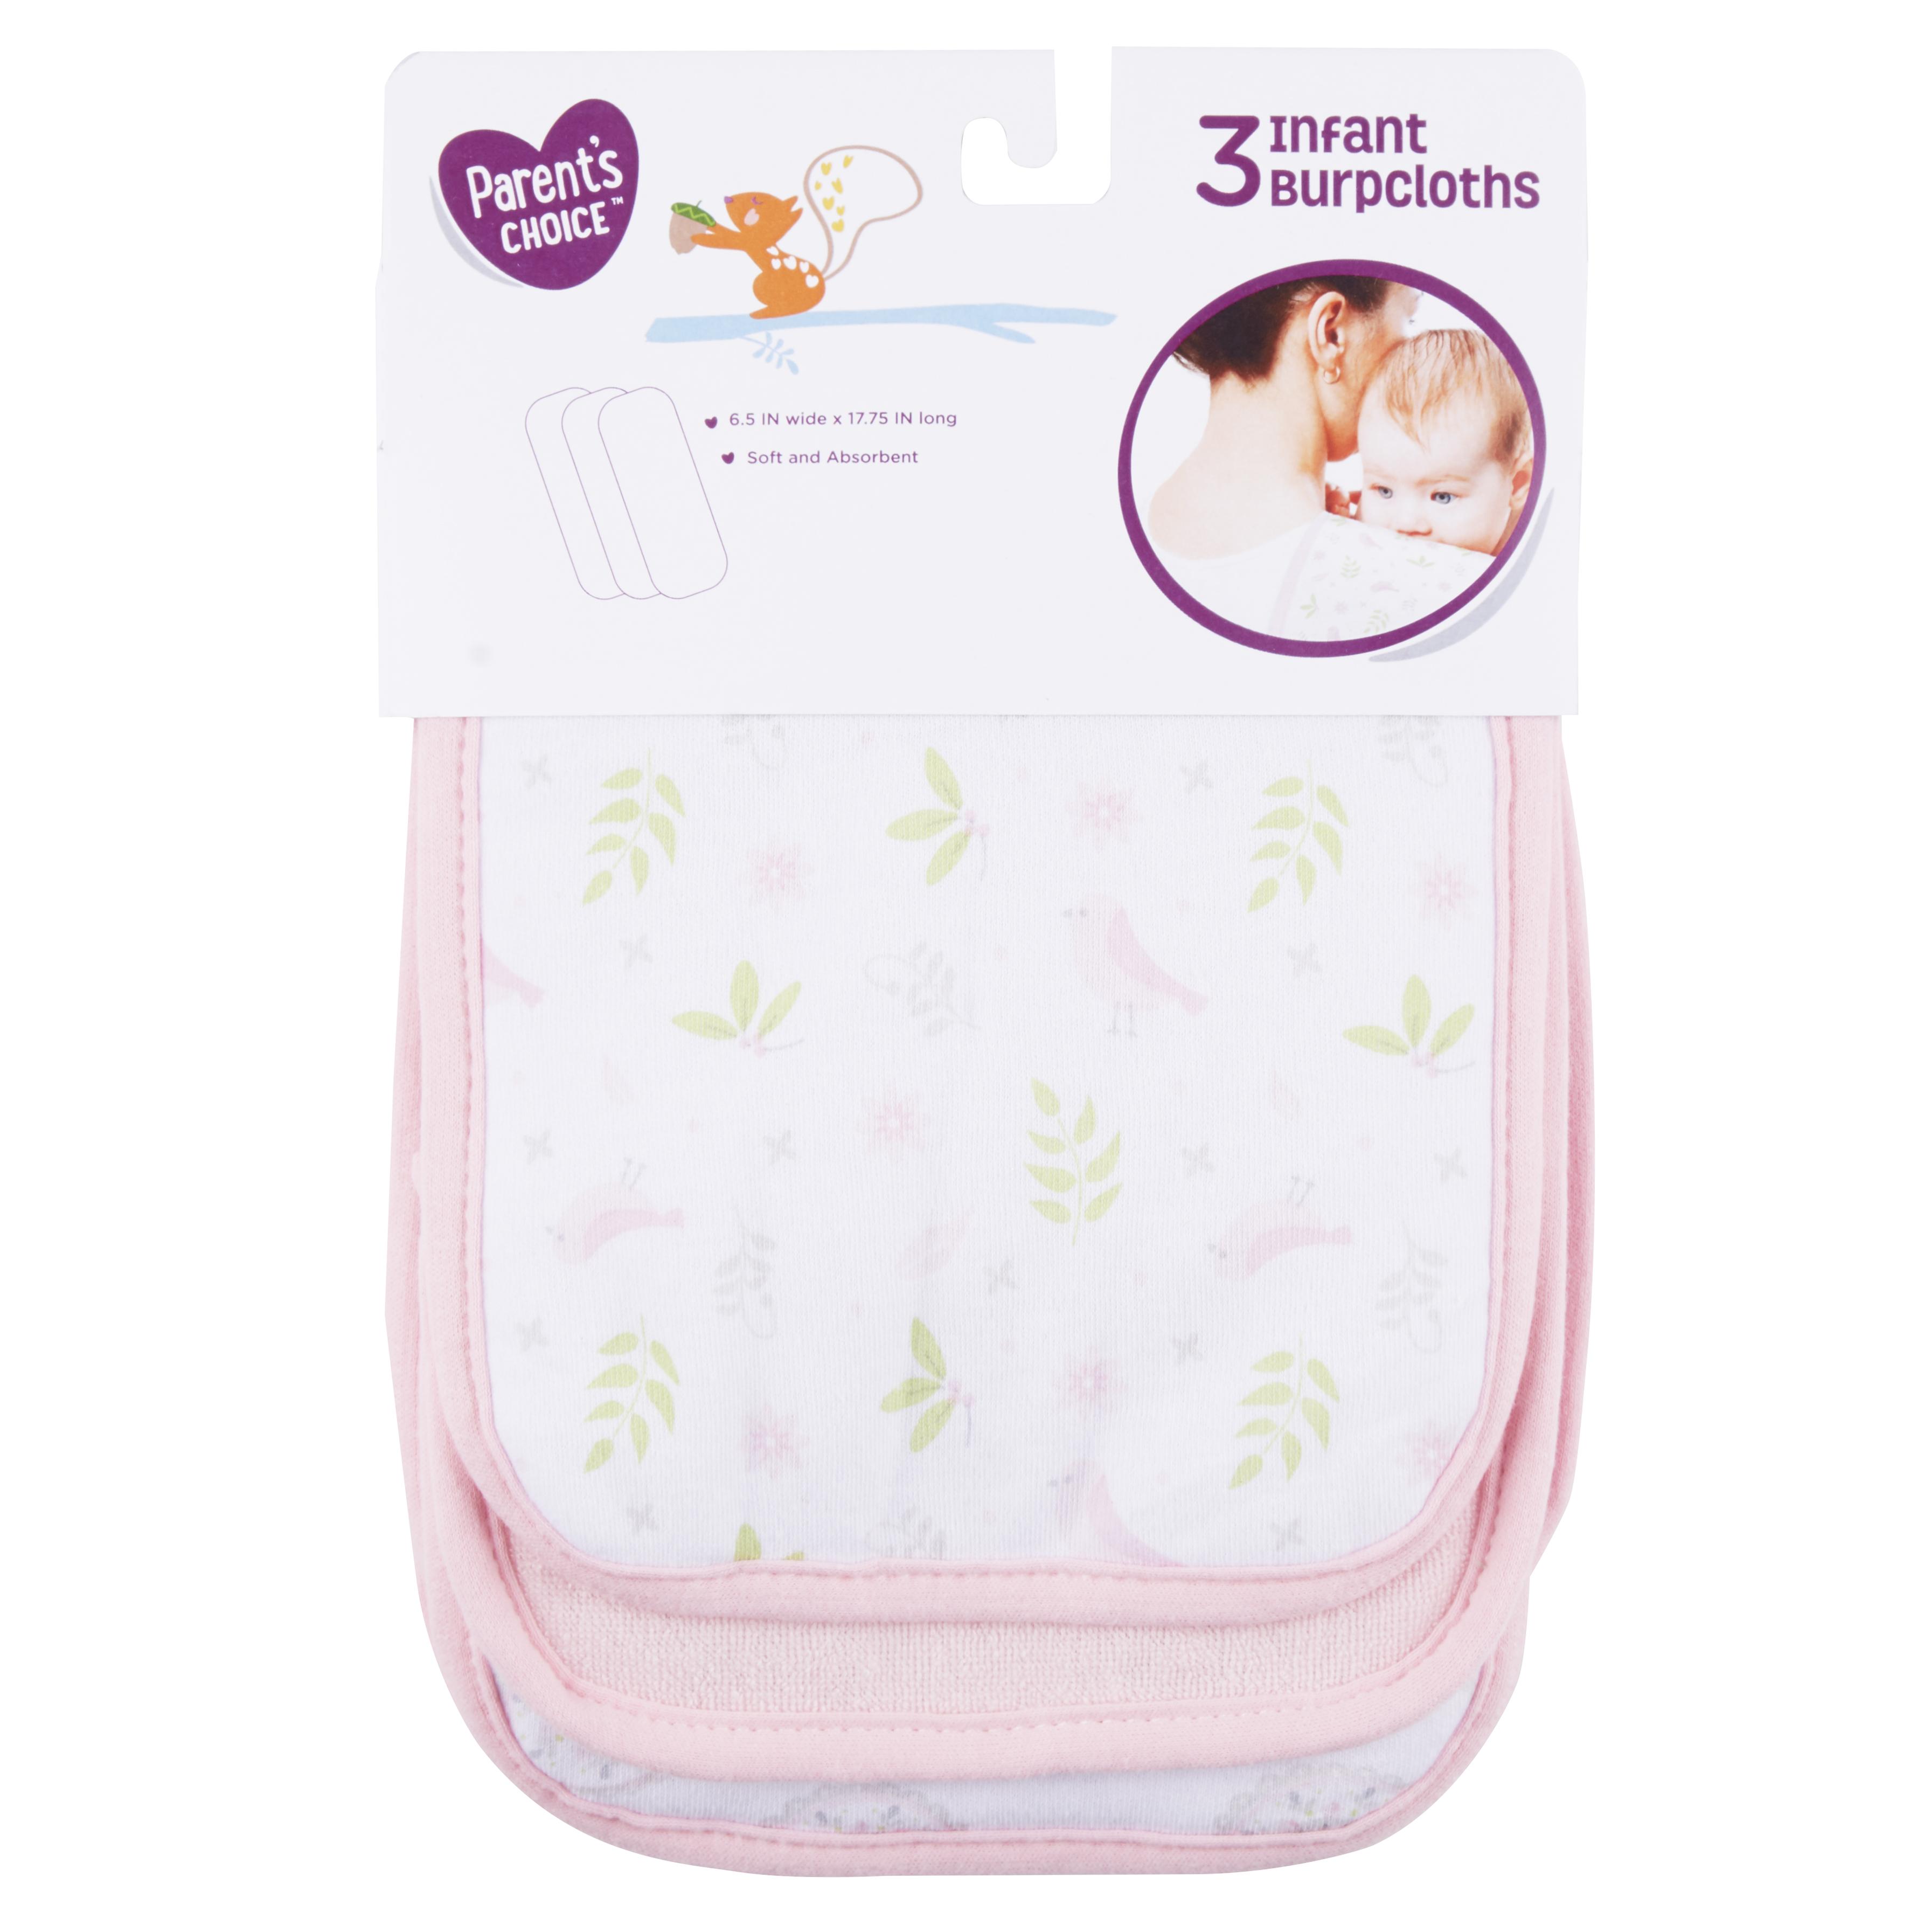 Parent's Choice Girl Burpcloths, 3 Pack